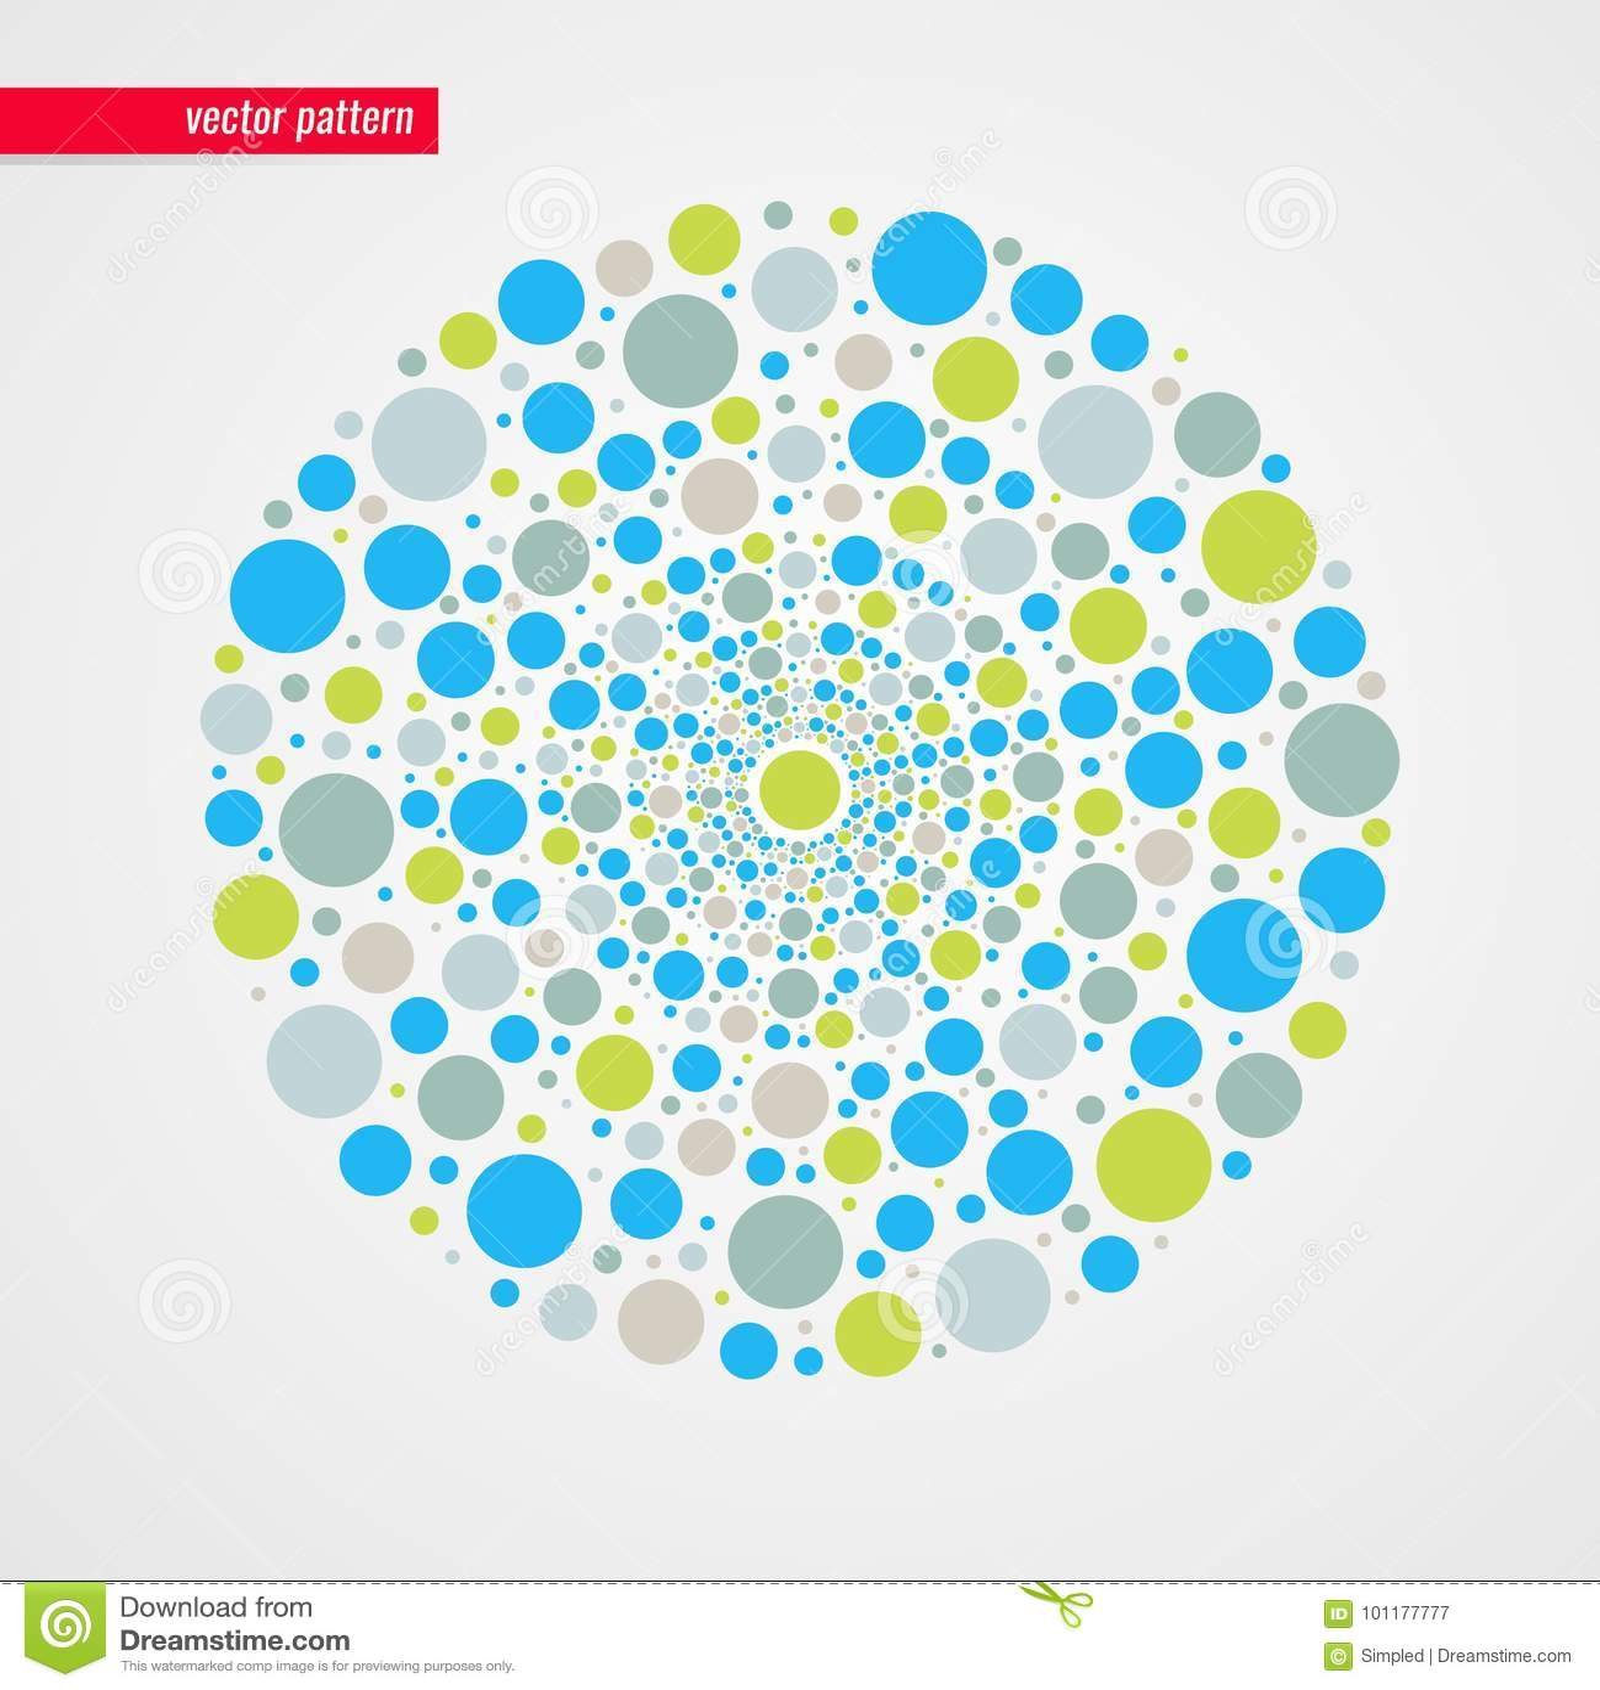 Abstract blue green beige bubbles vector pattern. Decorative design element. Happy illustration for decoration, concept kid design